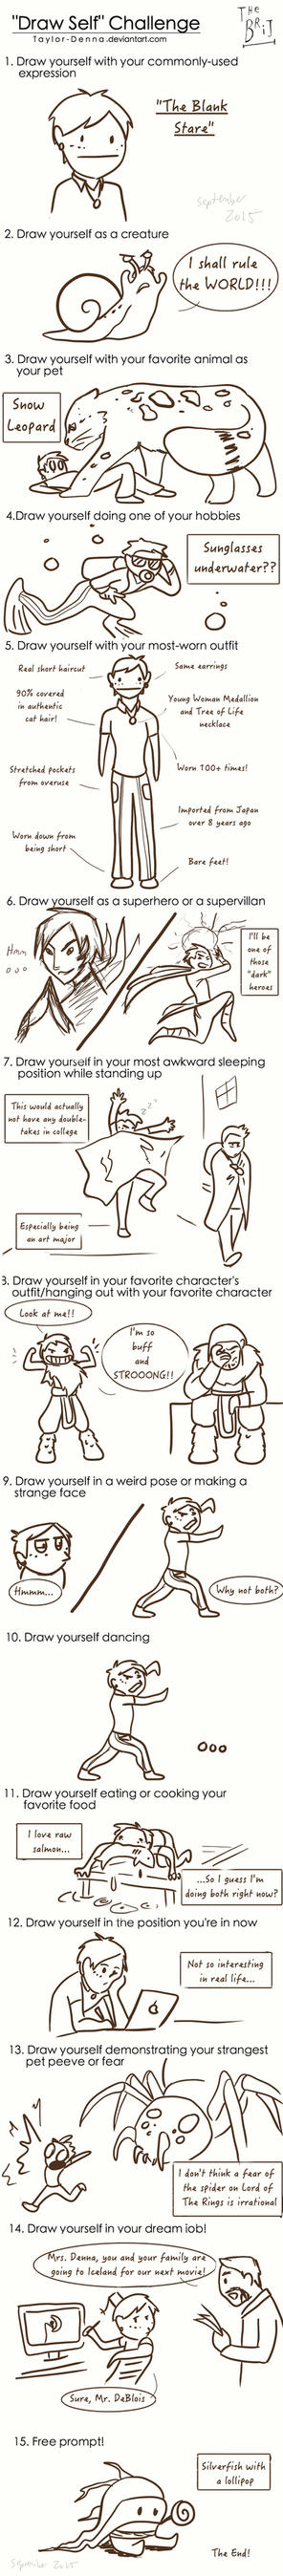 Draw Self Challenge by Taylor-Denna